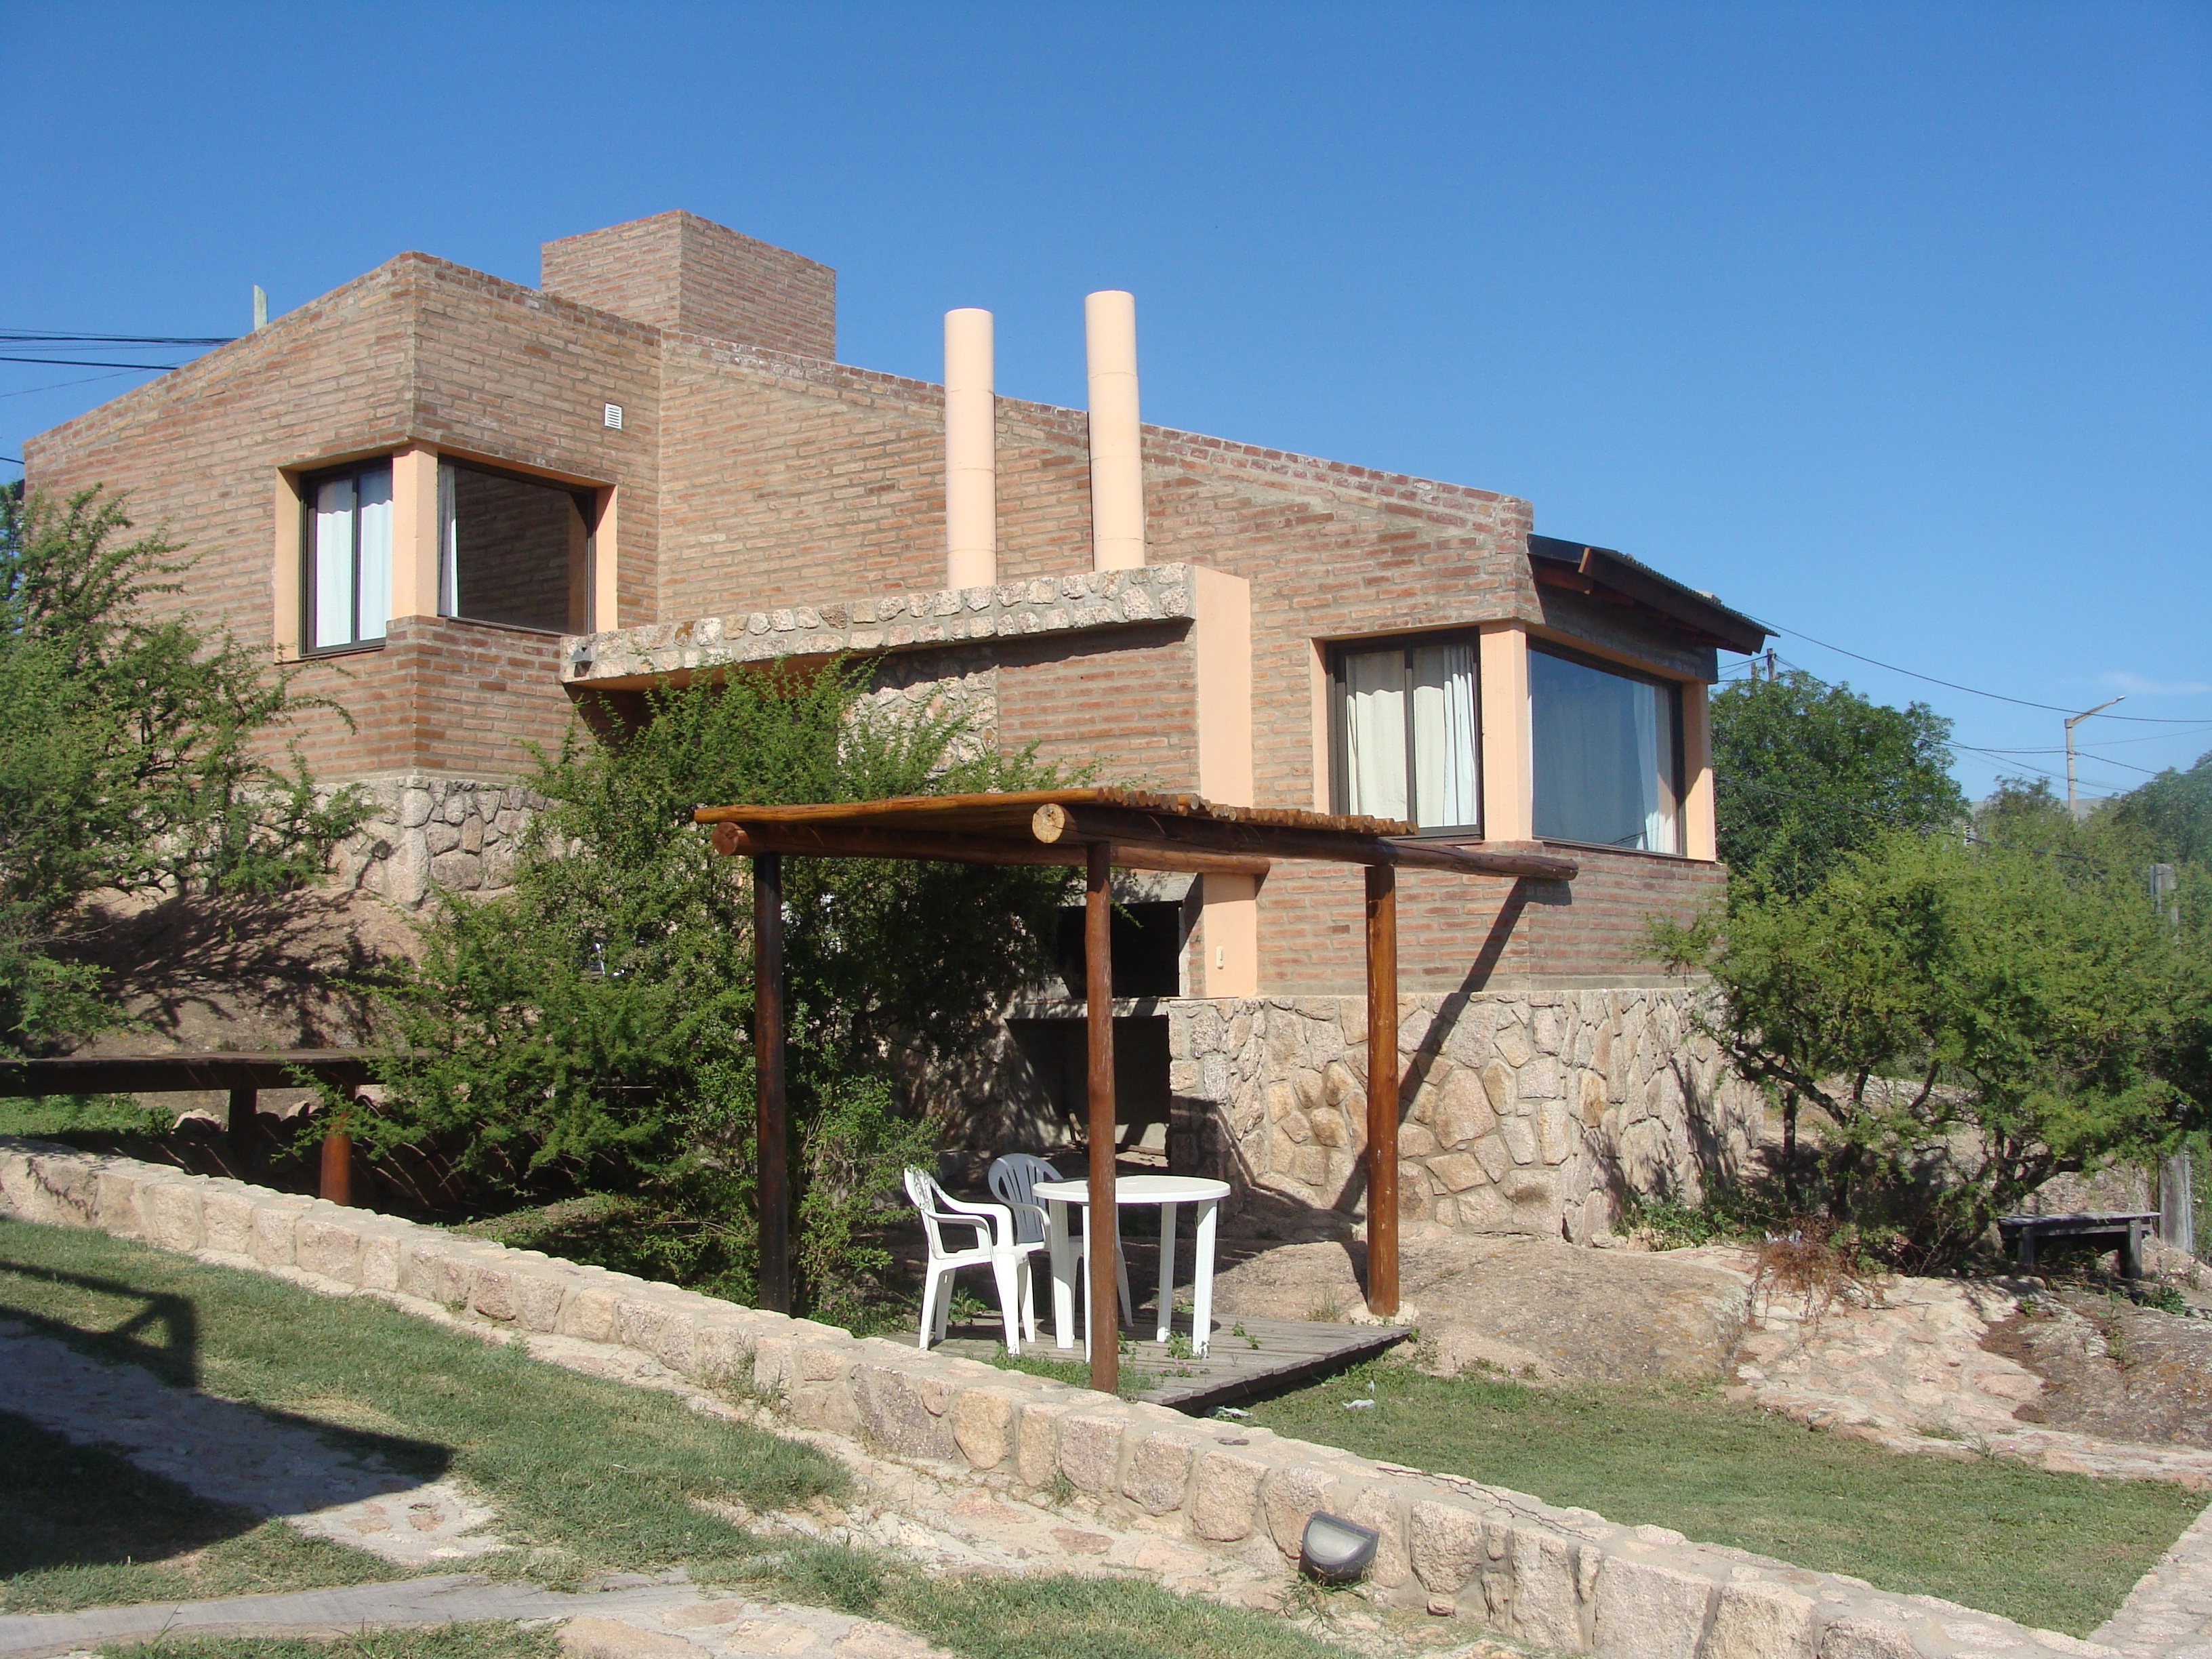 For sale house villa carlos paz cordoba argentina - Carlos cordoba ...